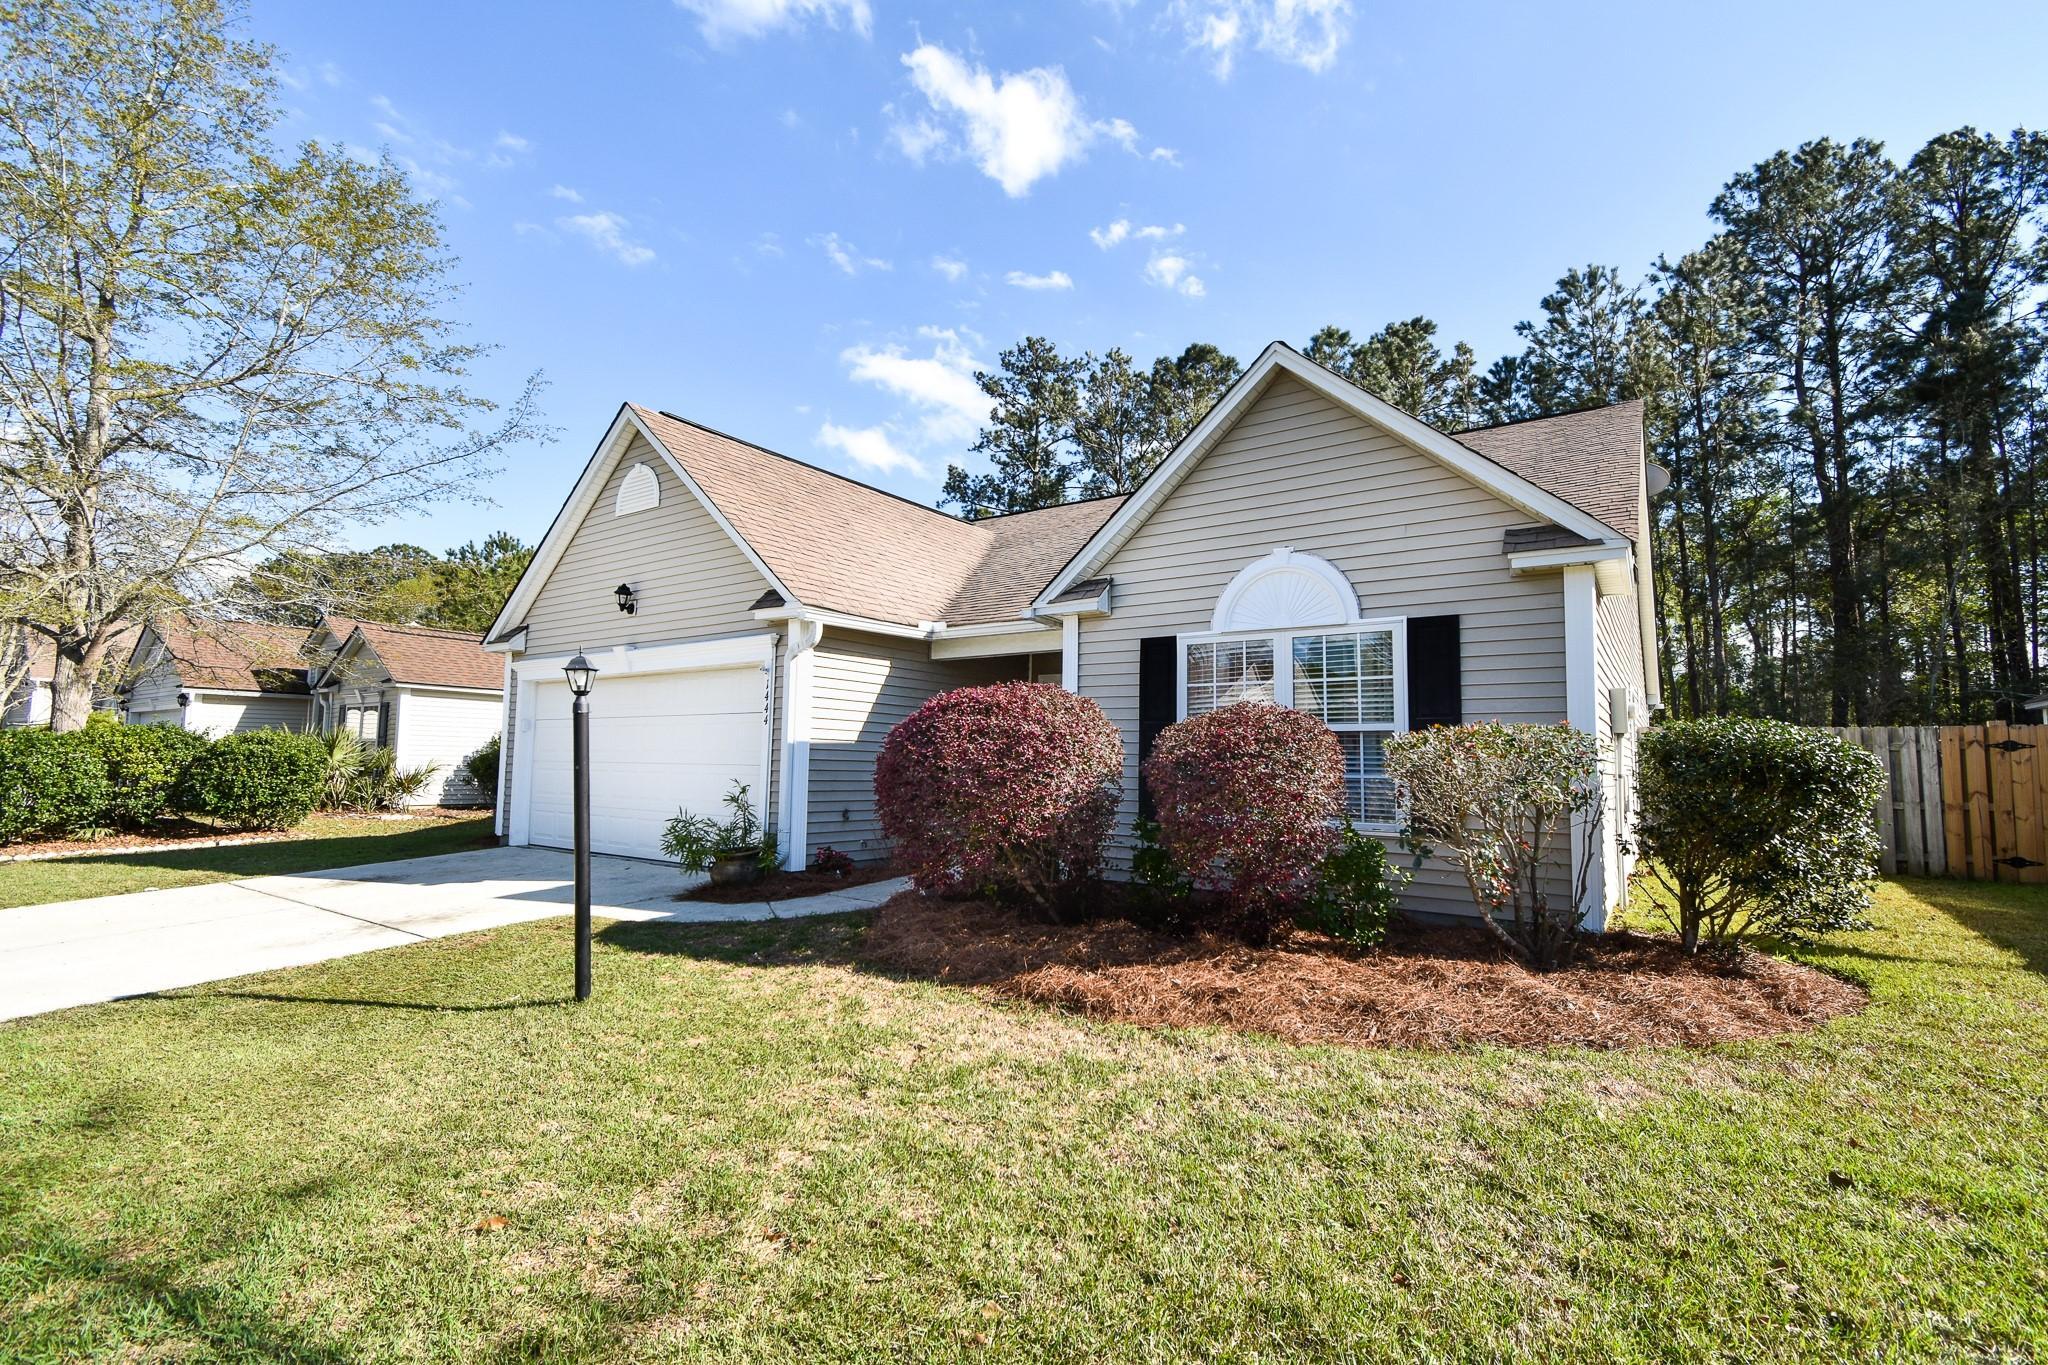 Park West Homes For Sale - 1444 Wellesley, Mount Pleasant, SC - 13